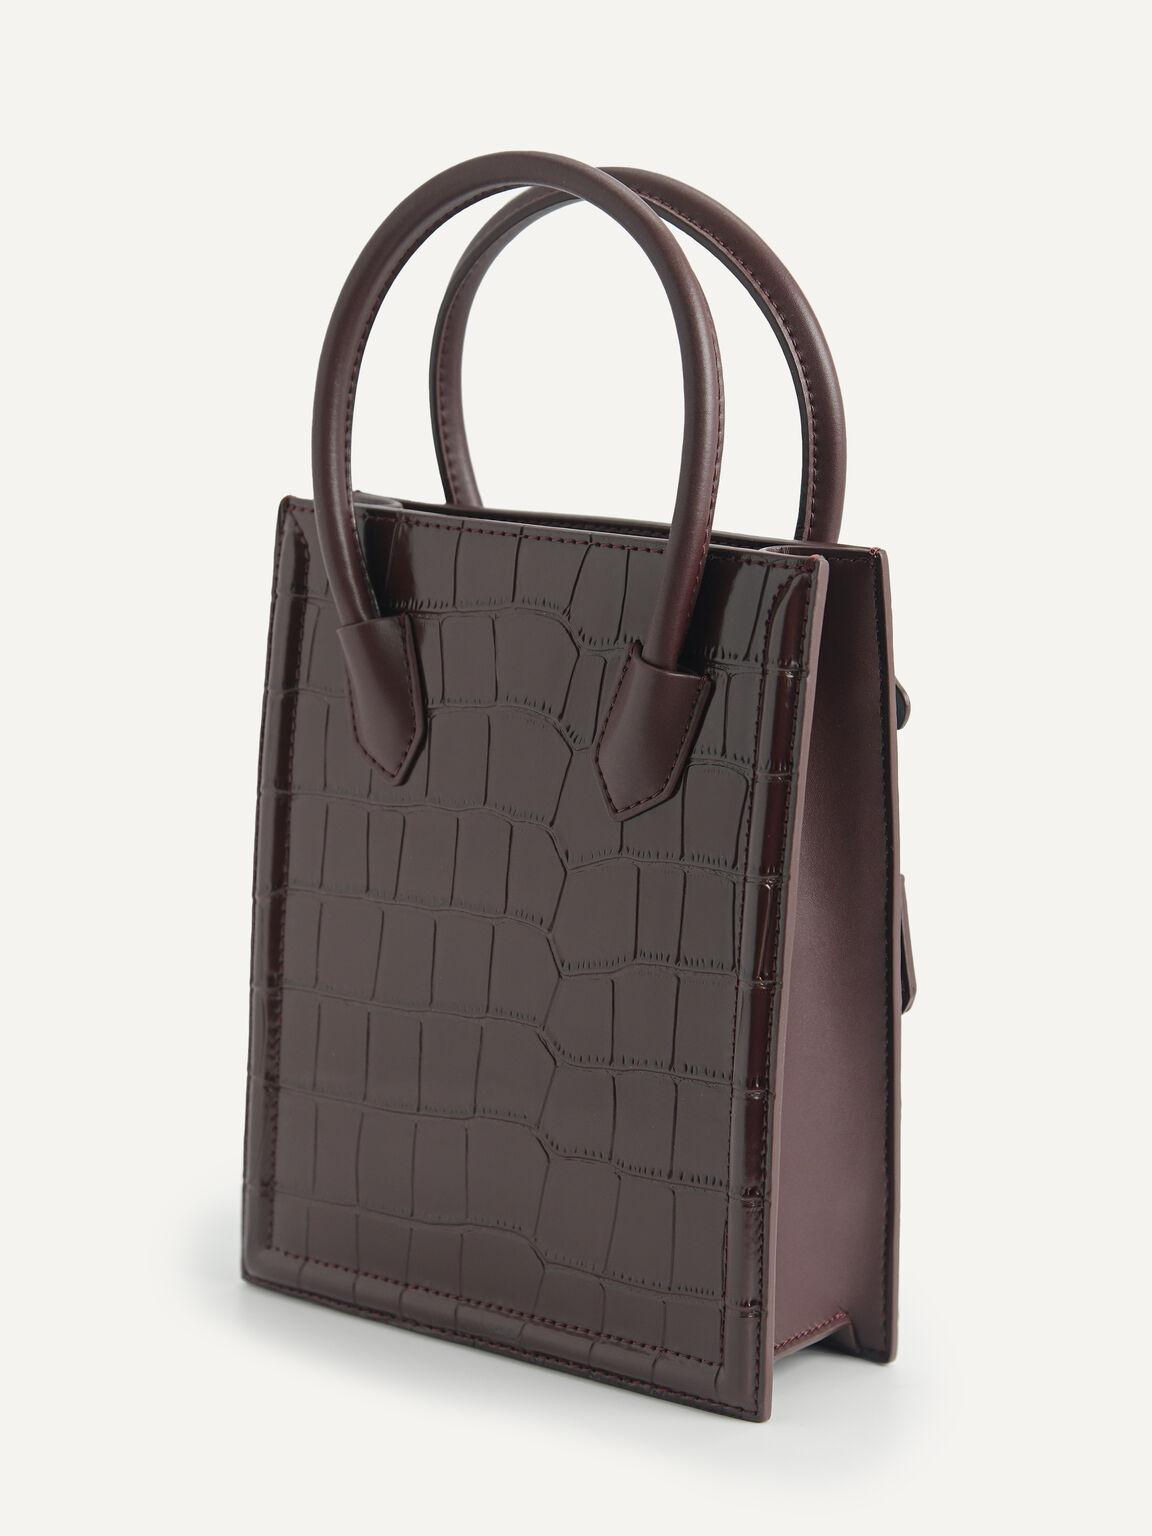 Croc-Effect Leather Tote, Mahogany, hi-res